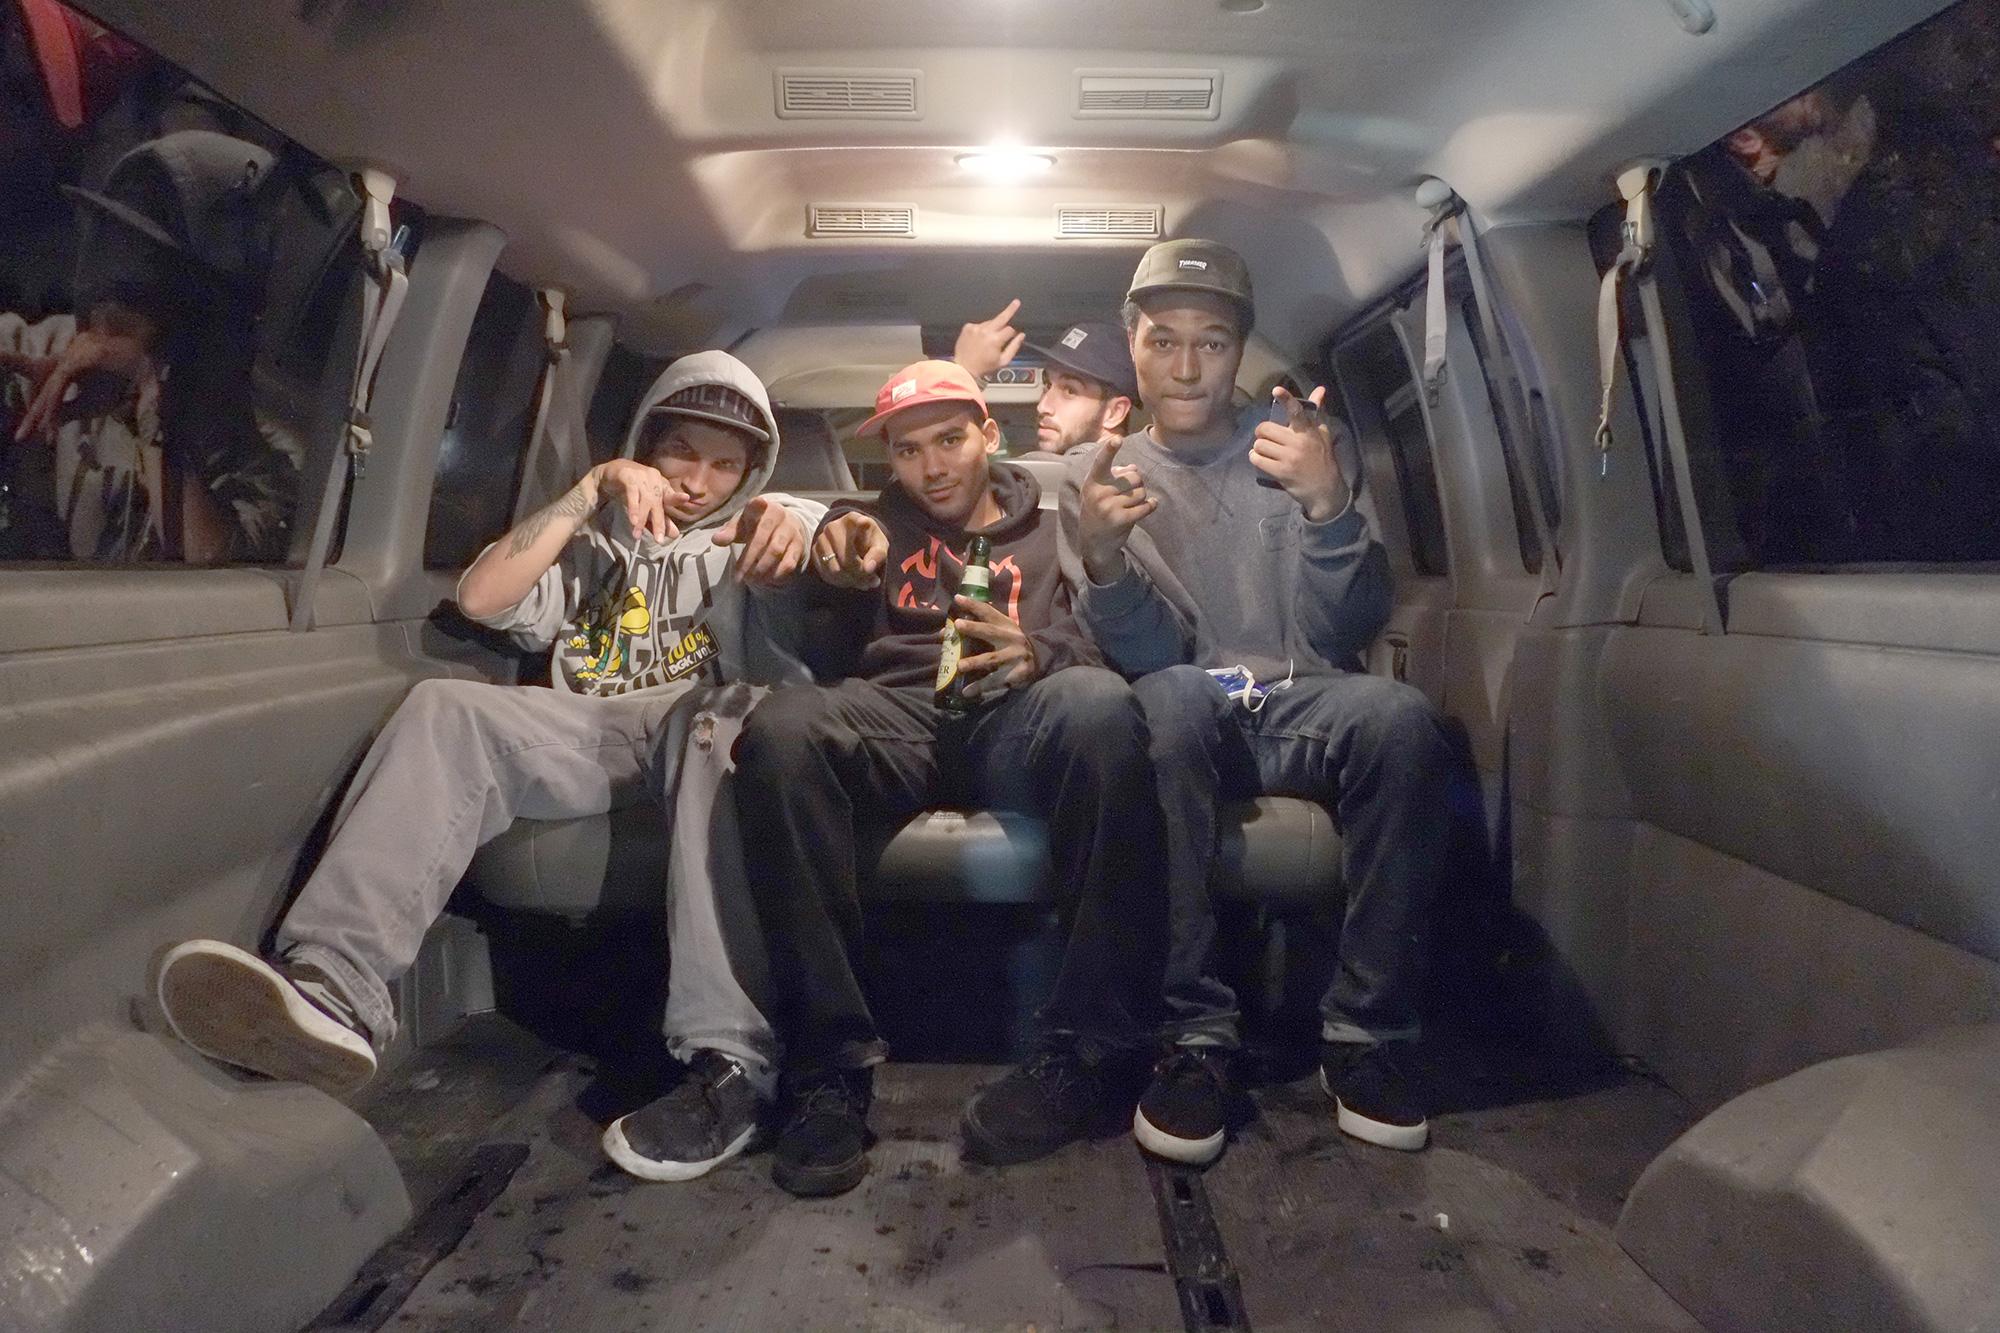 Robbie, Josh, and James in the Van